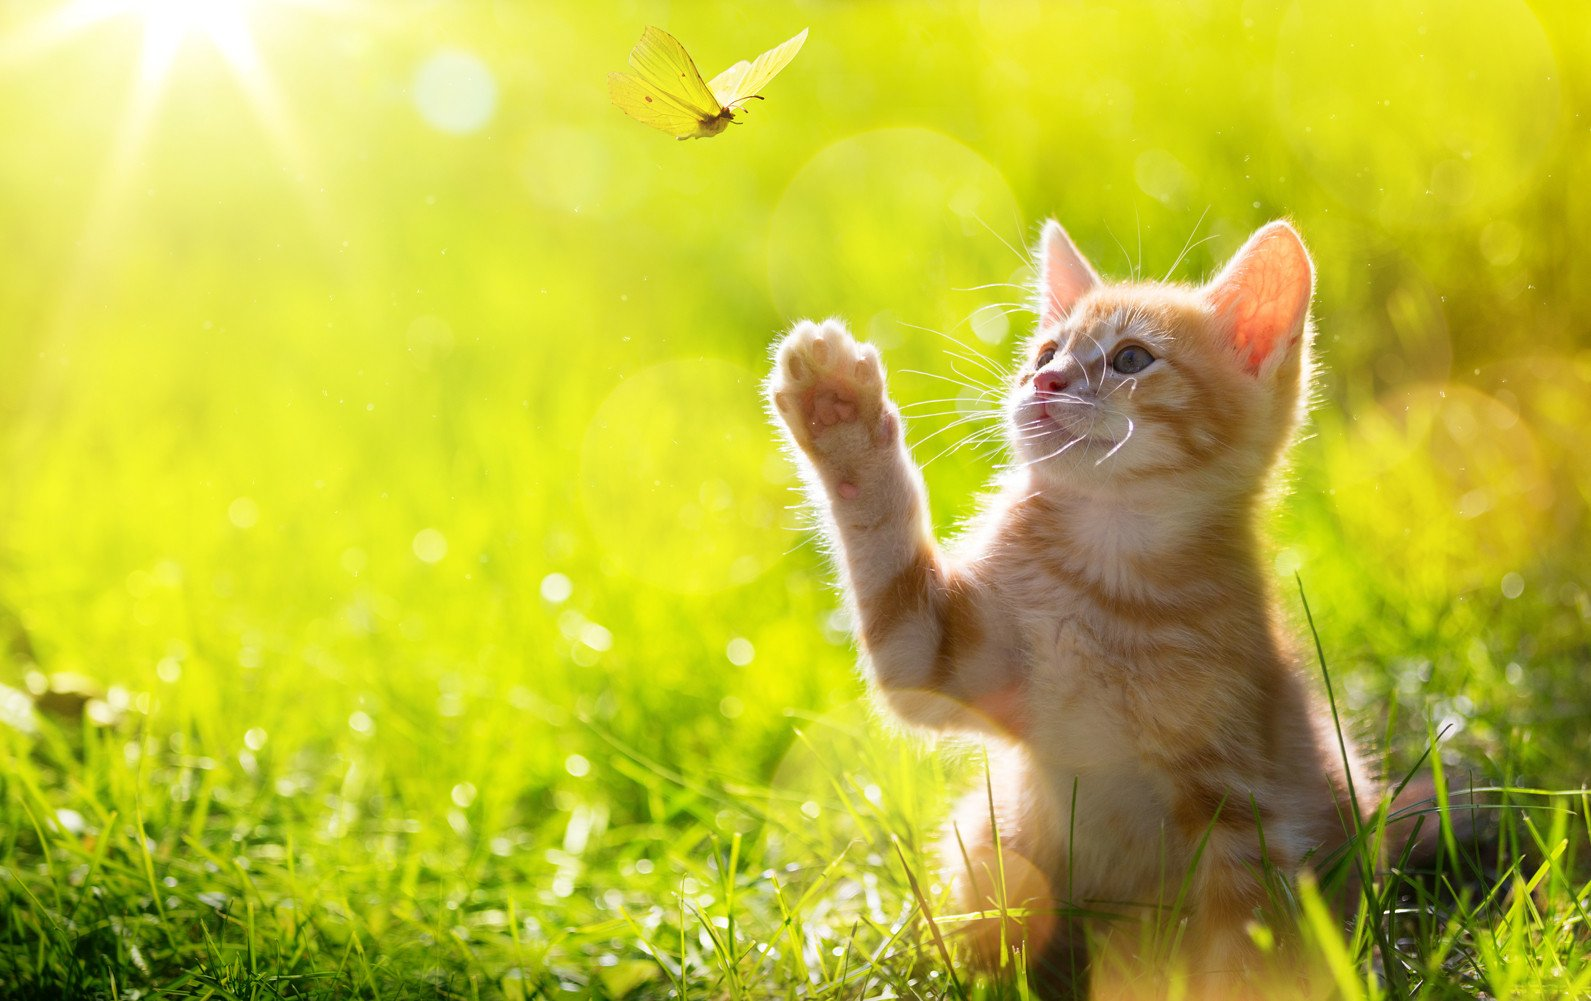 CHOIS Custom Films CF3336 Animal Cat Playing Glass Window Privacy DIY Stickers 3' W by 2' H